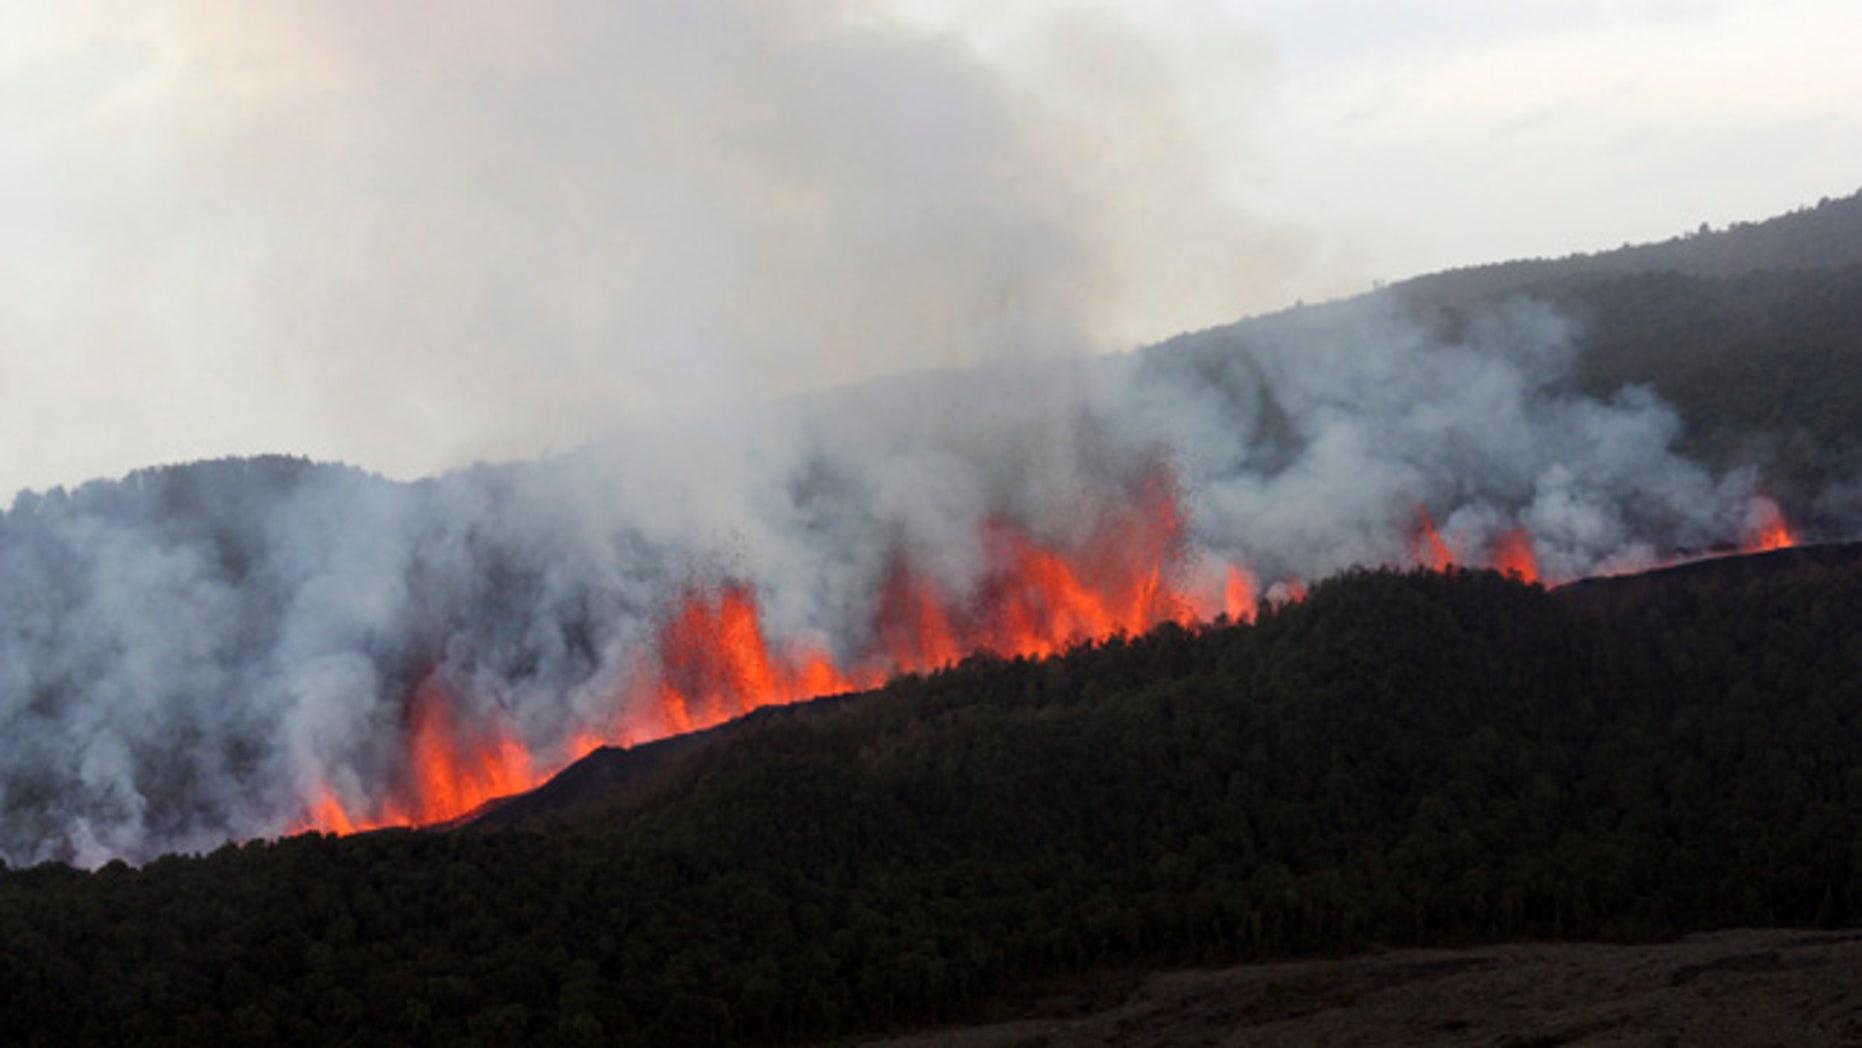 Lava flows down the slope of Nyamulagira volcano 25 miles northwest of Goma, North Kivu, Congo.